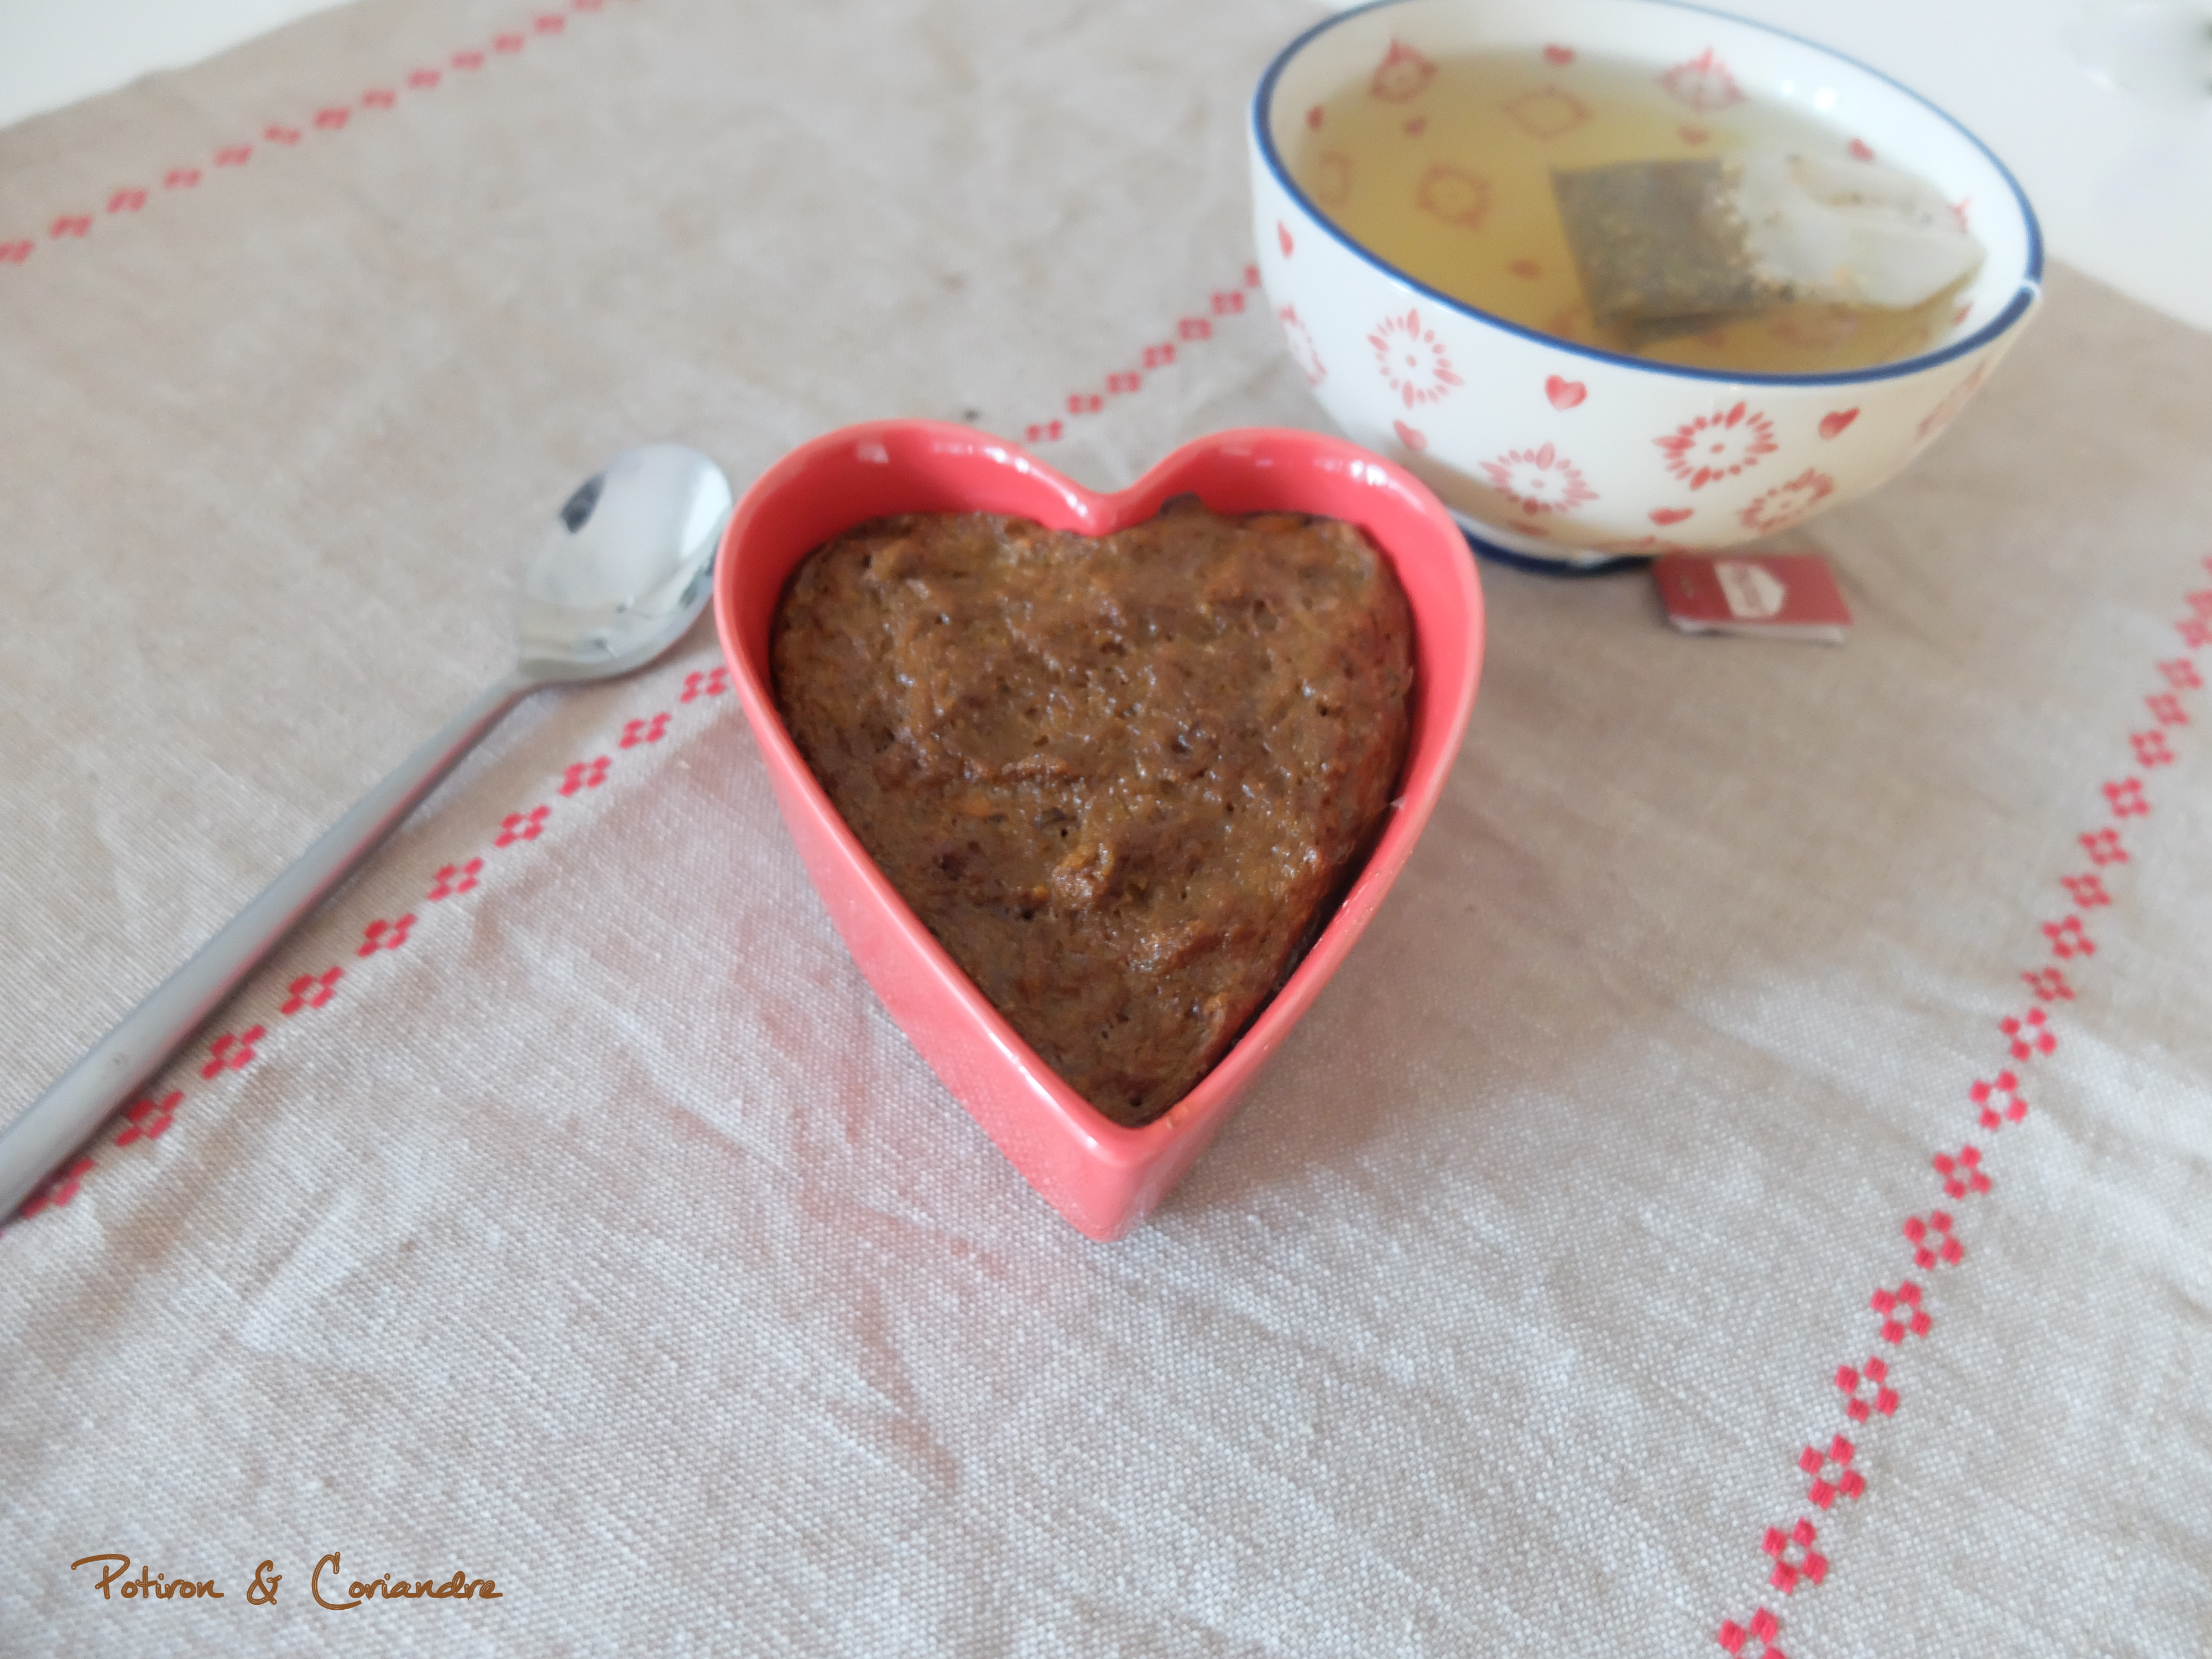 Recette Du Vrai Carotte Cake